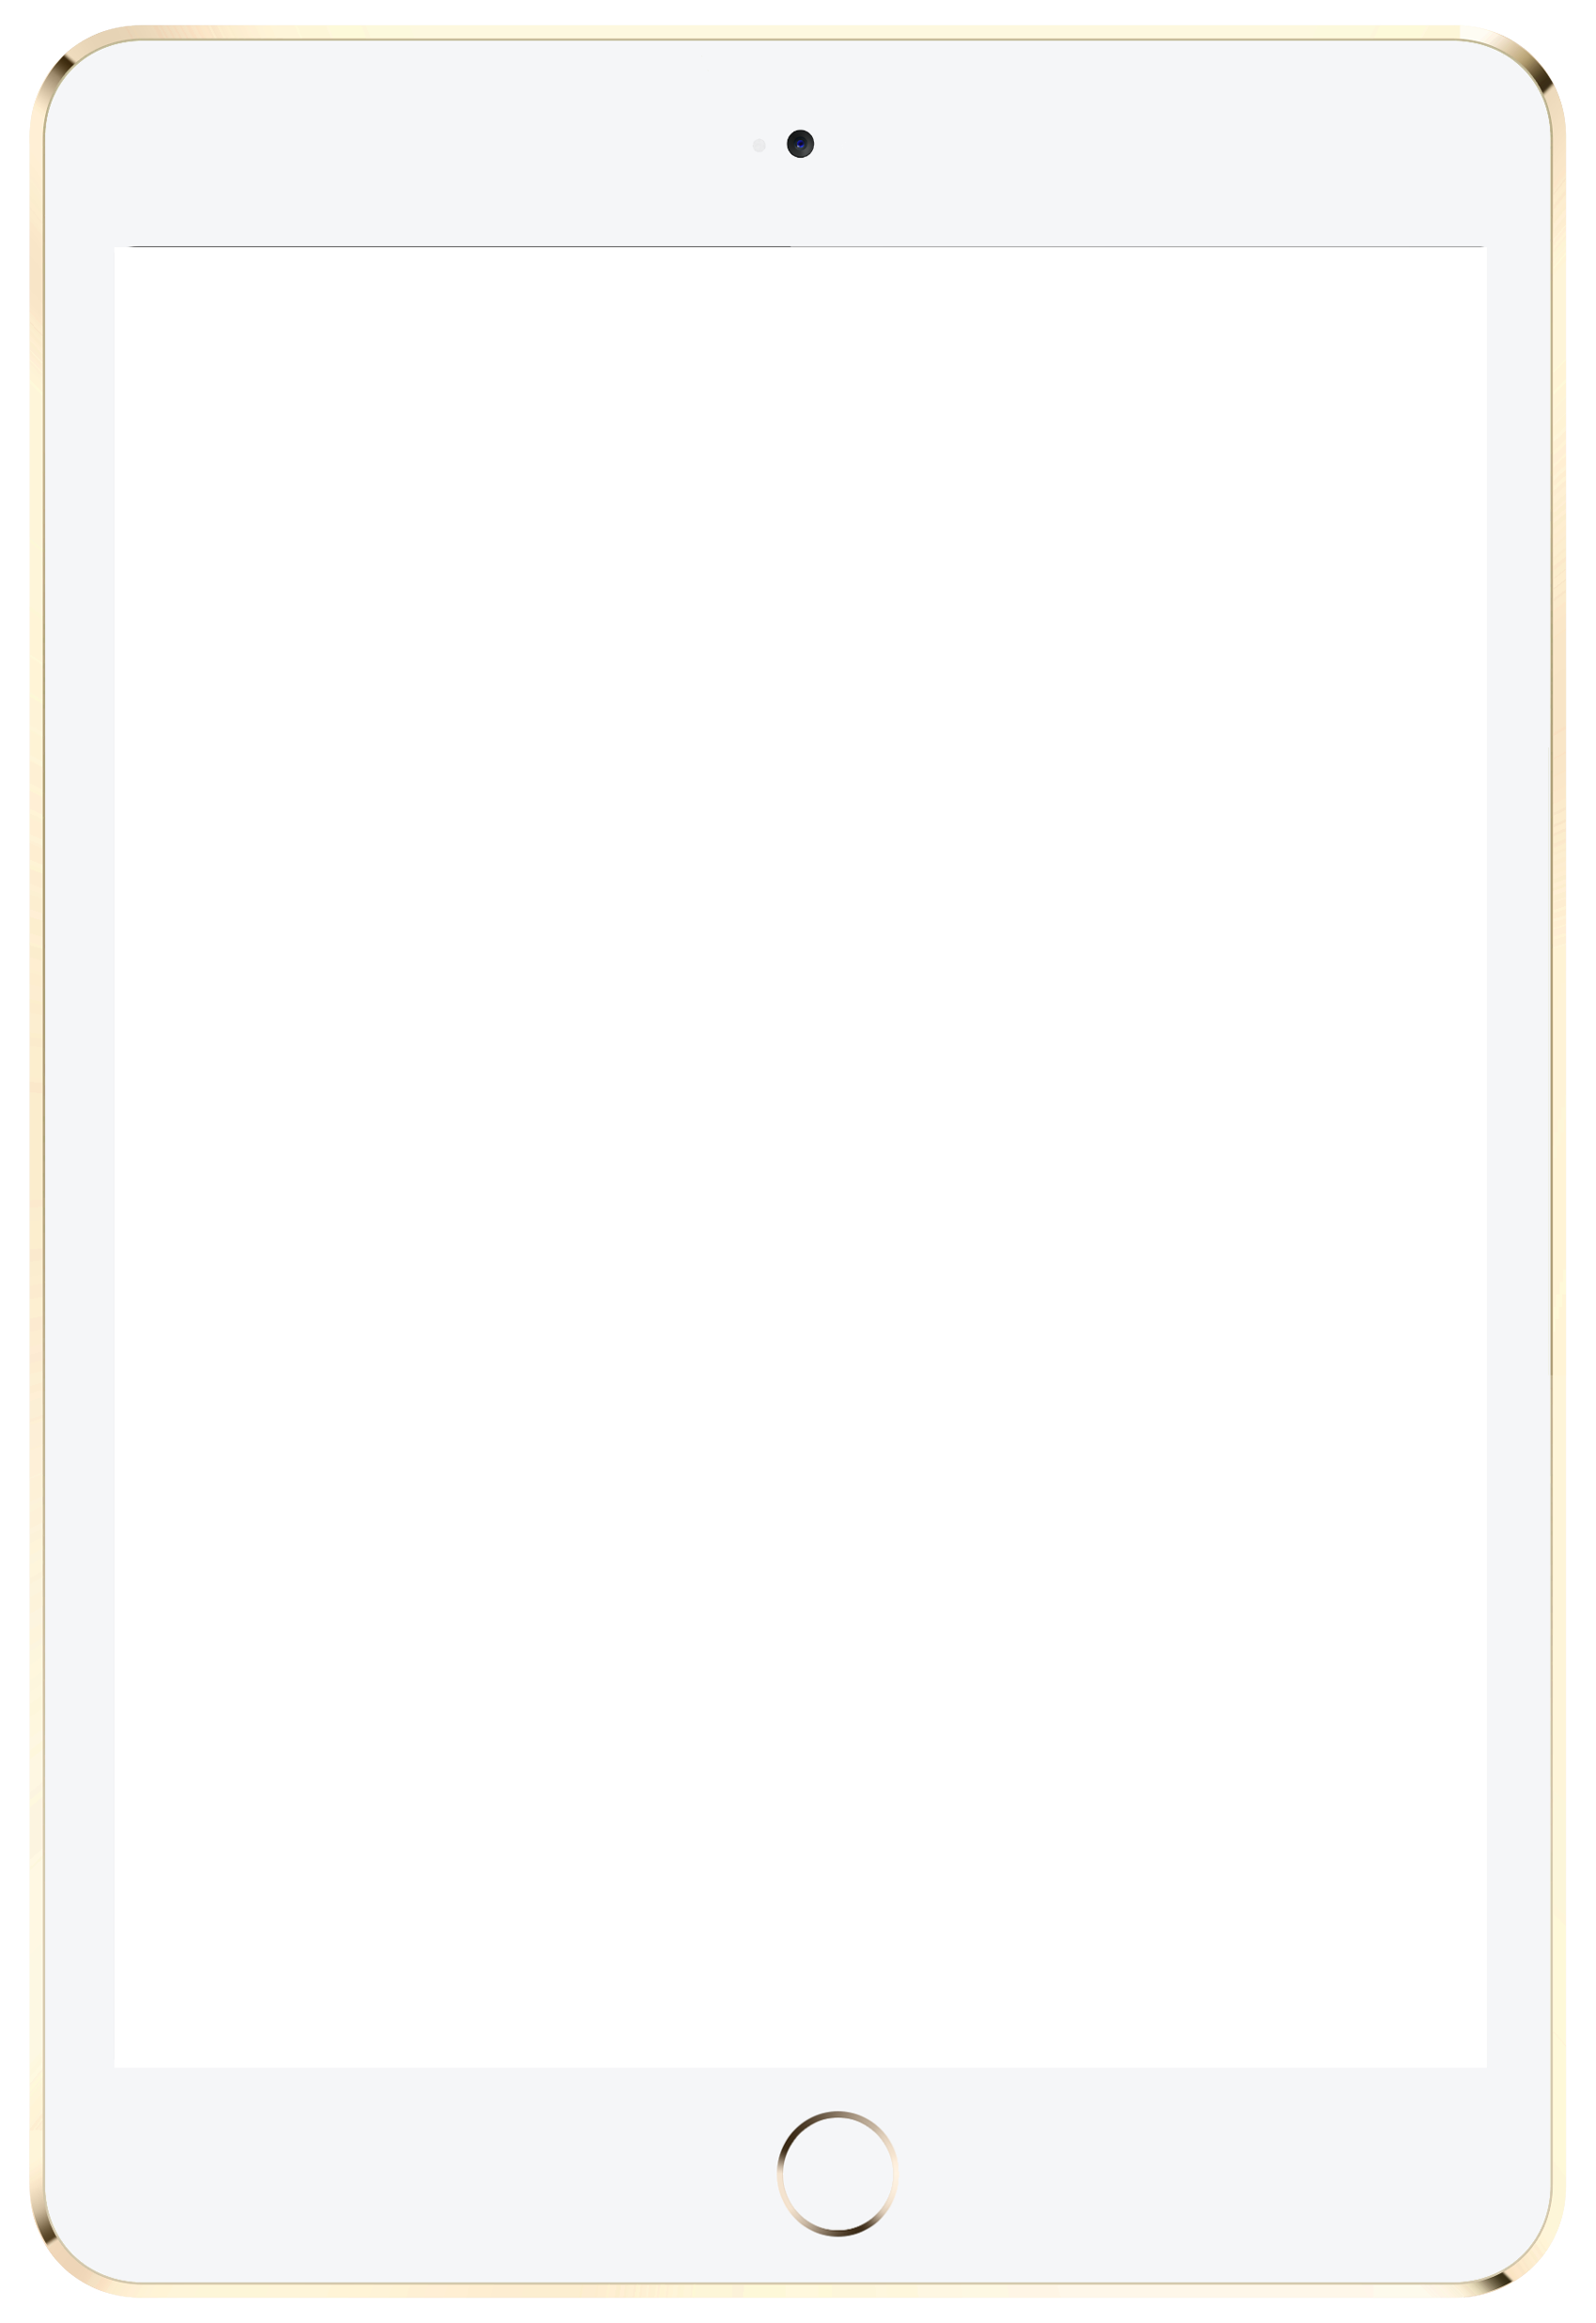 Ipad PNG - 72728